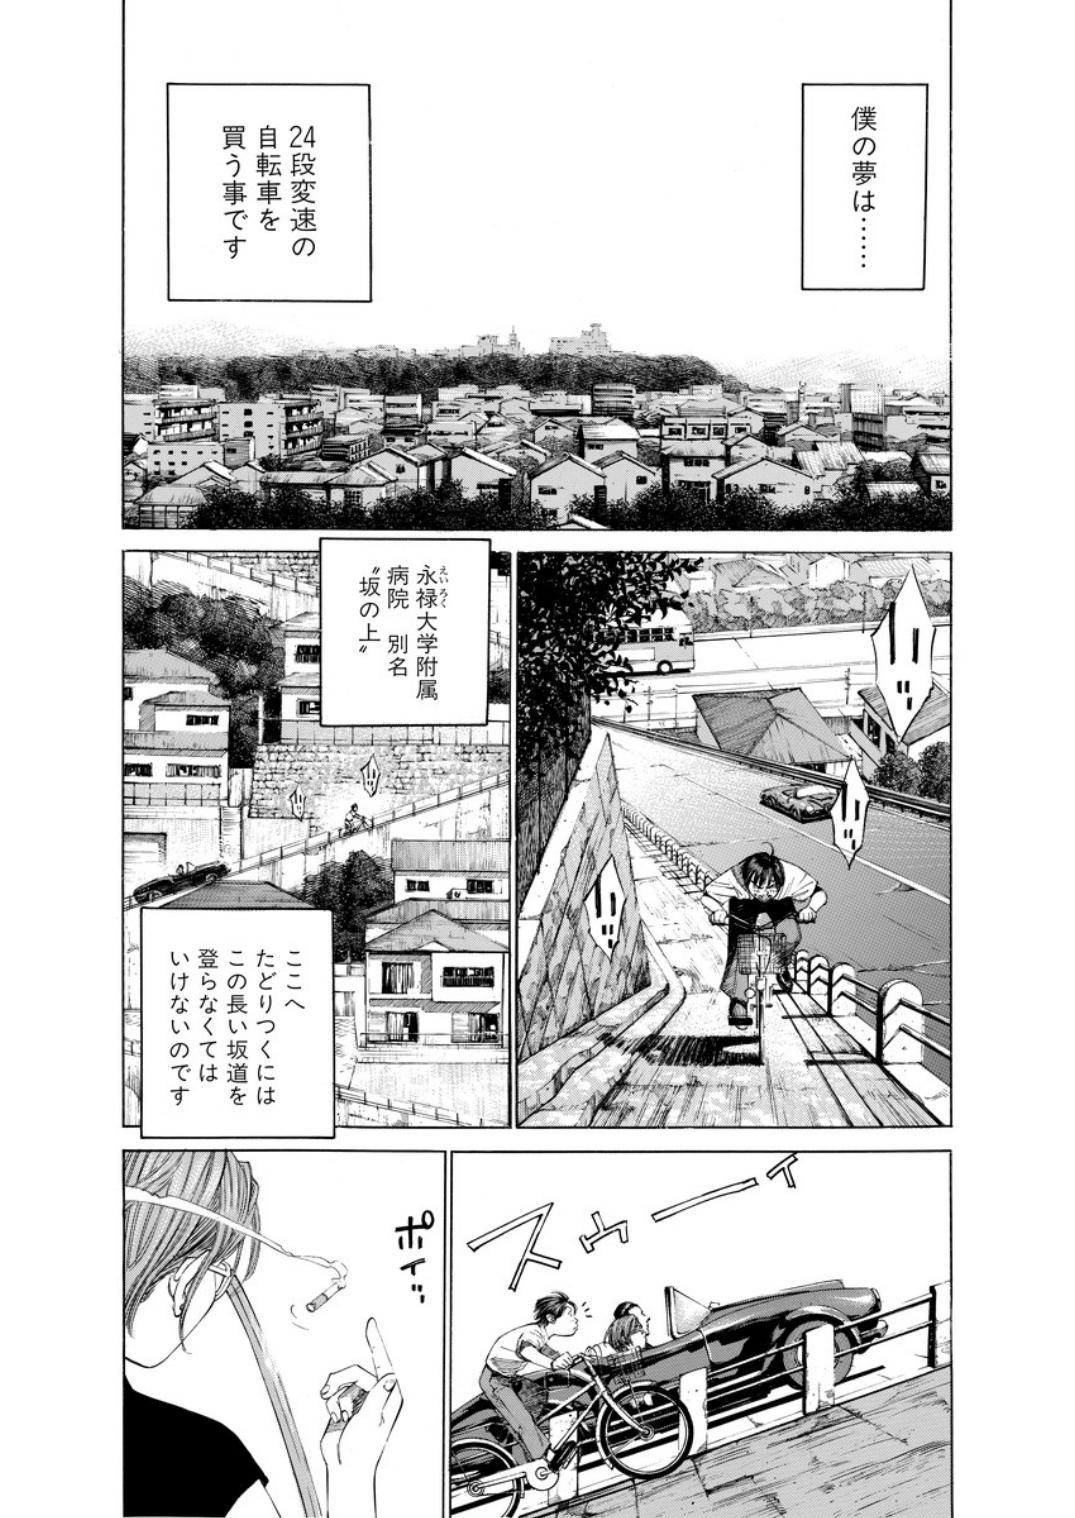 001bj_page-0189.jpg